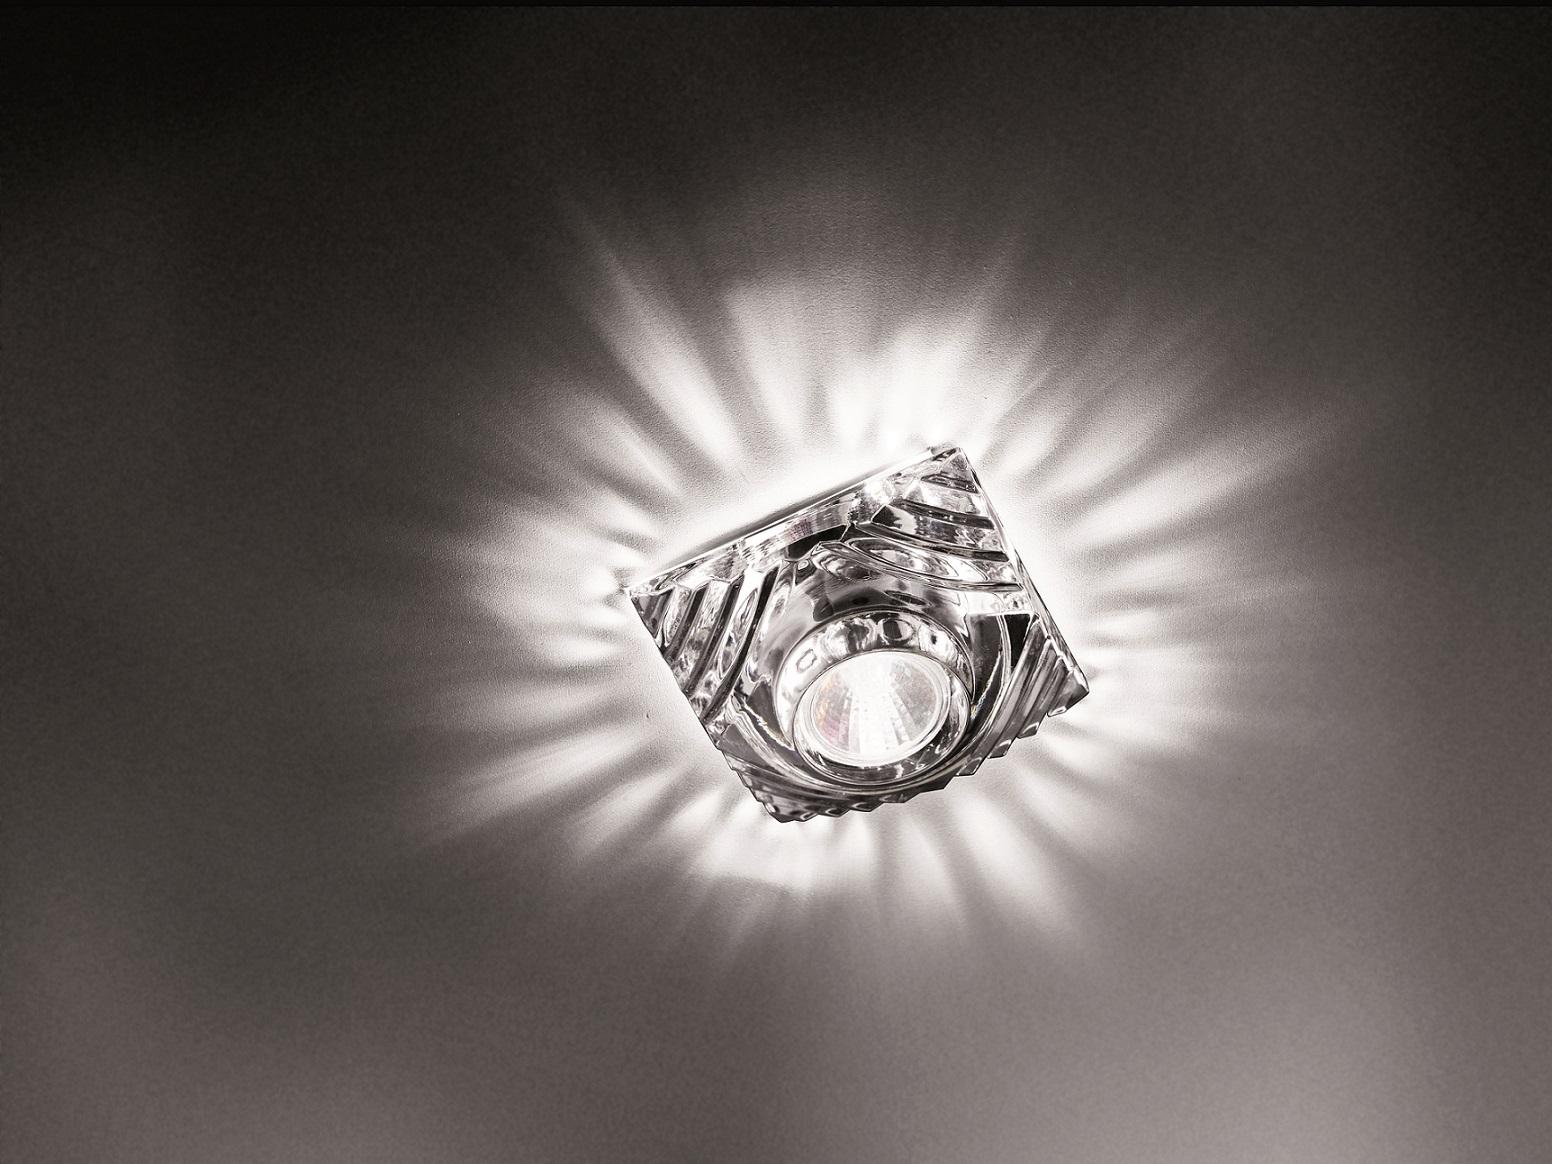 Crystal Spotlight Mencar 8cm Gy6.35 1x35w sin transformador Cristal de Bohemia